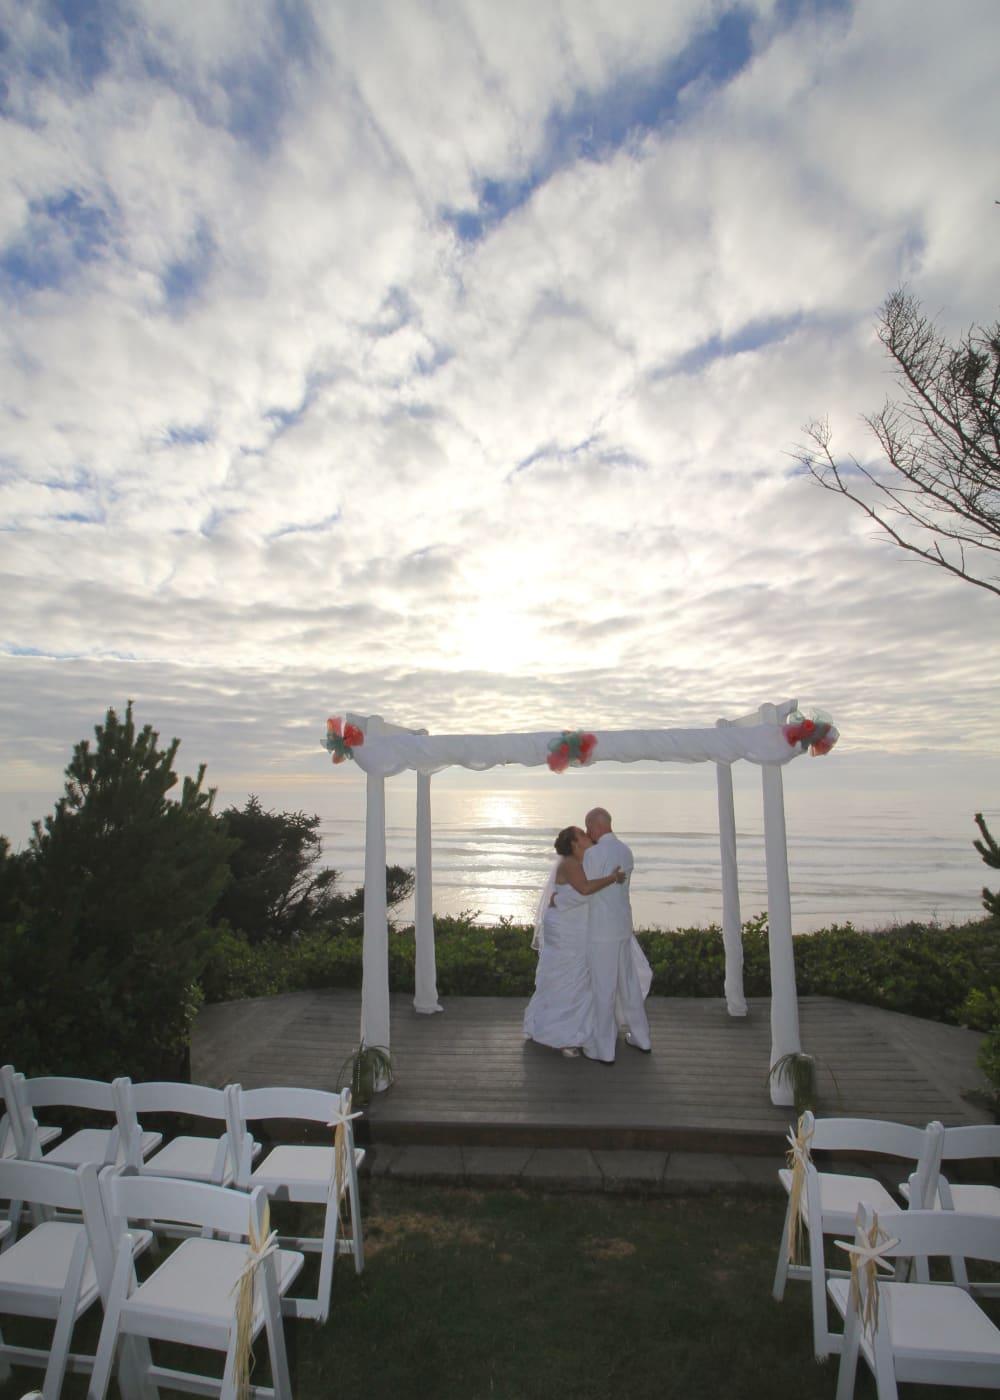 Wedding Wise: What type of wedding do I want?